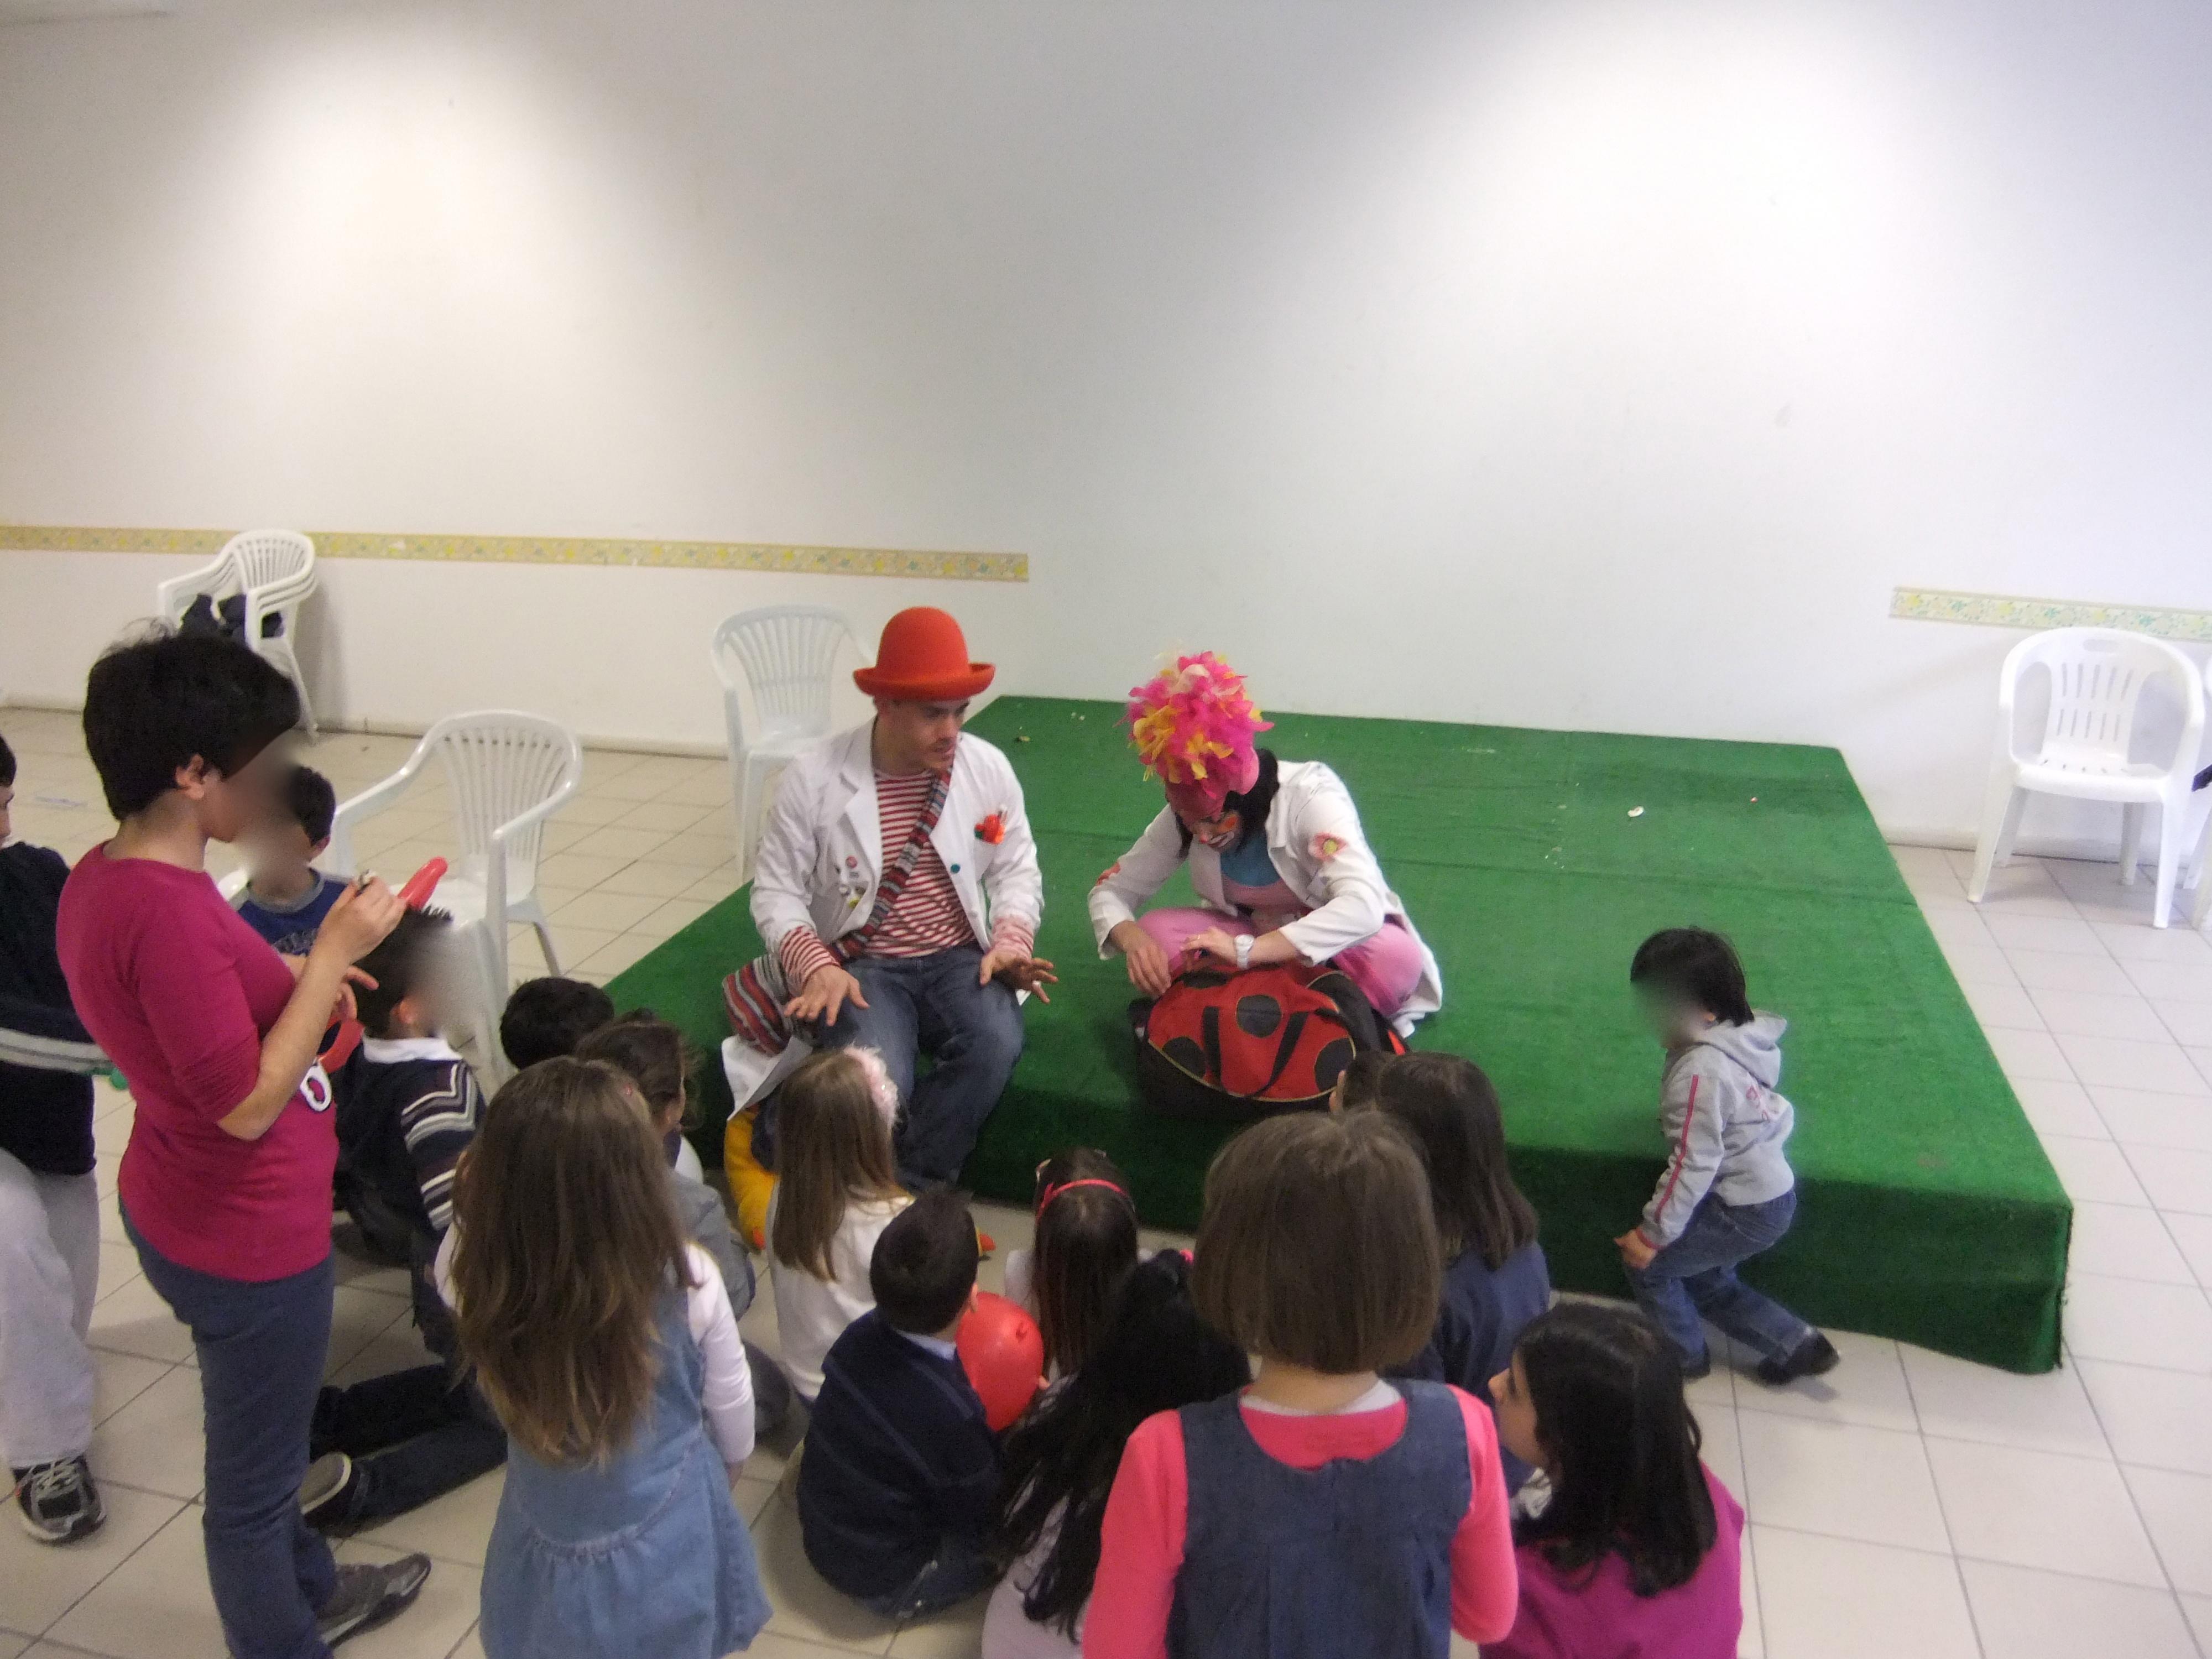 I clown di Chimaera con un gruppo di bimbi